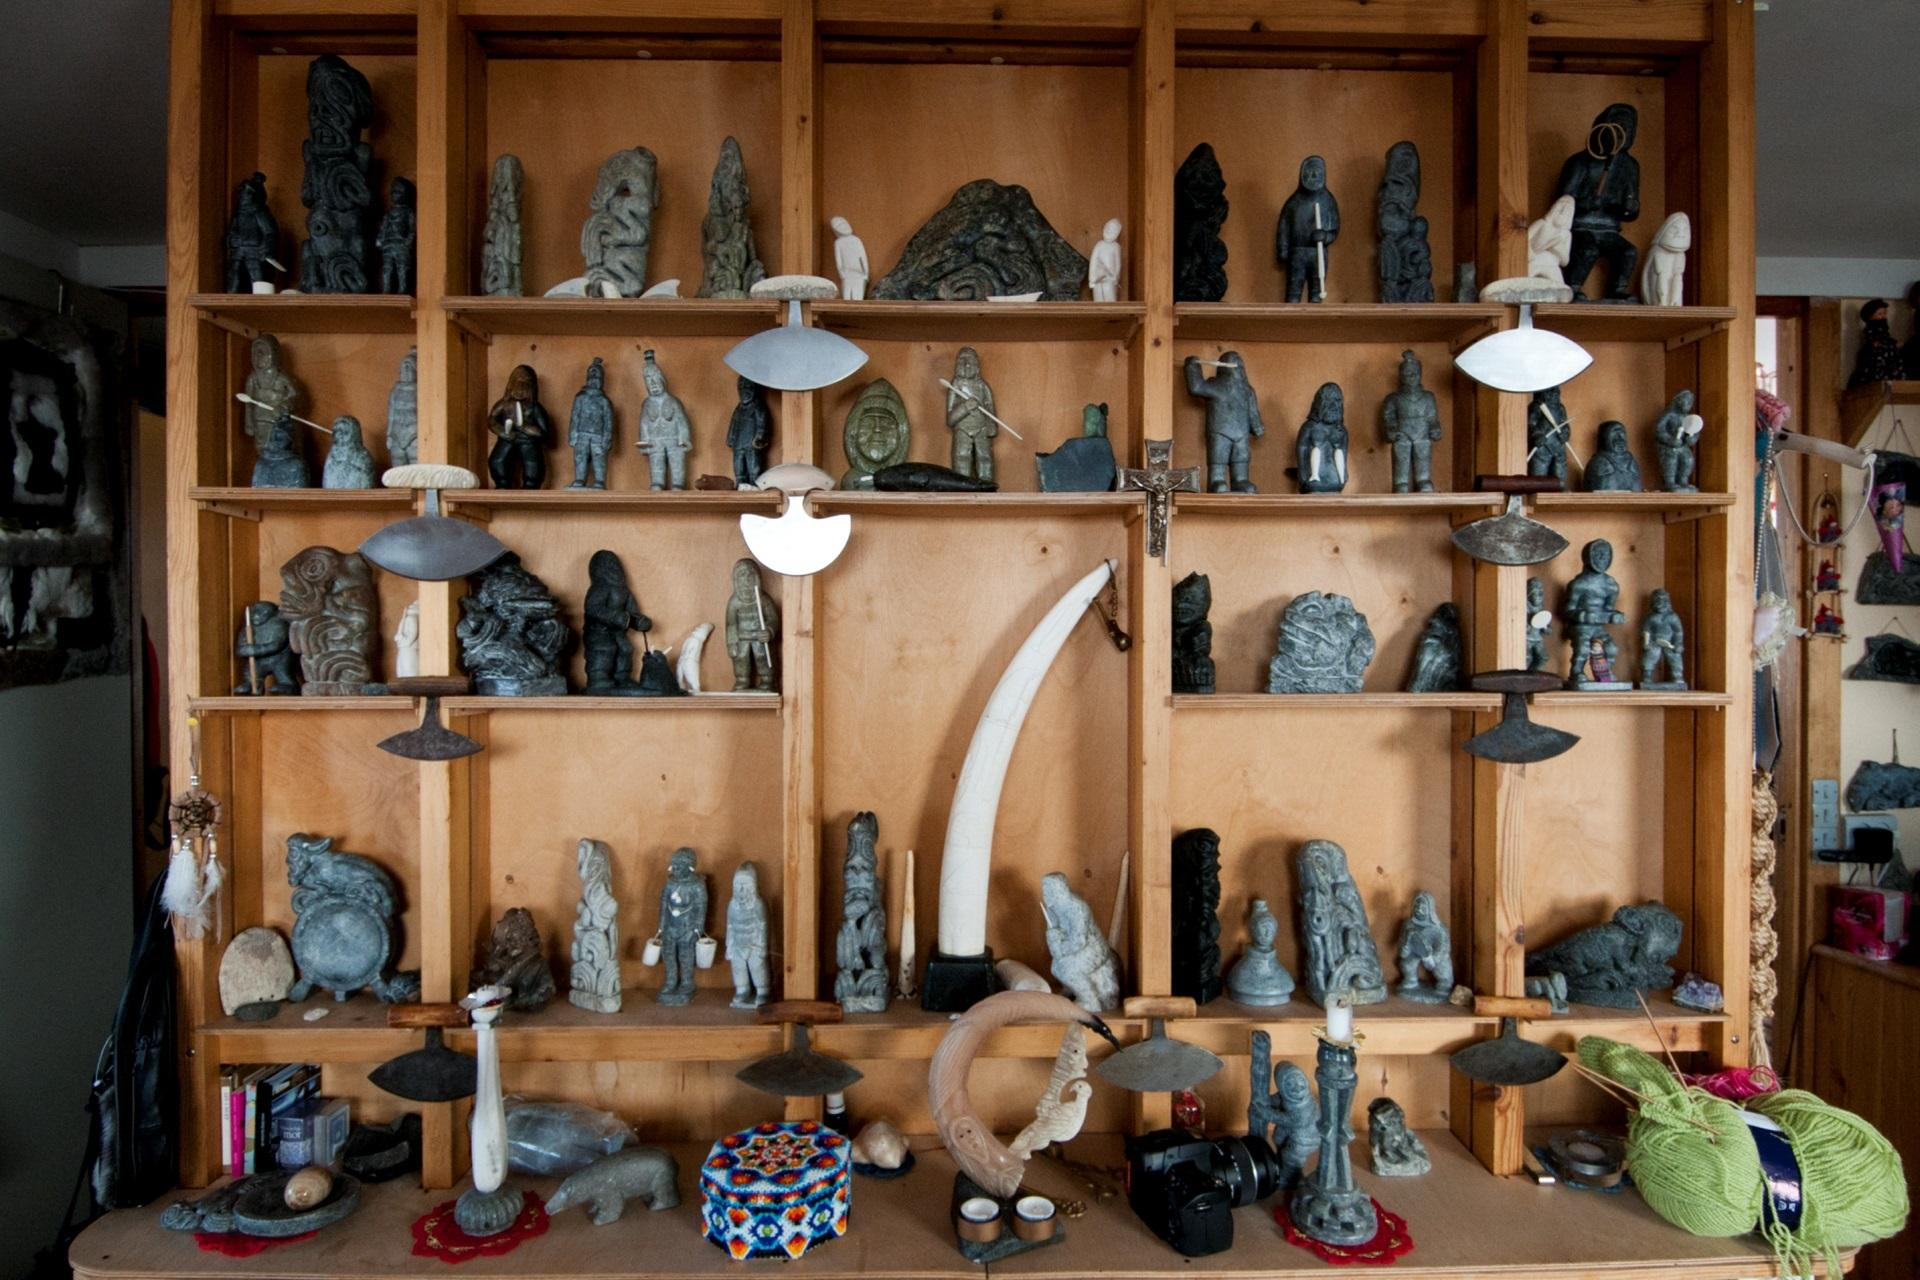 Shelf with Soapstone Art. By Mads Pihl